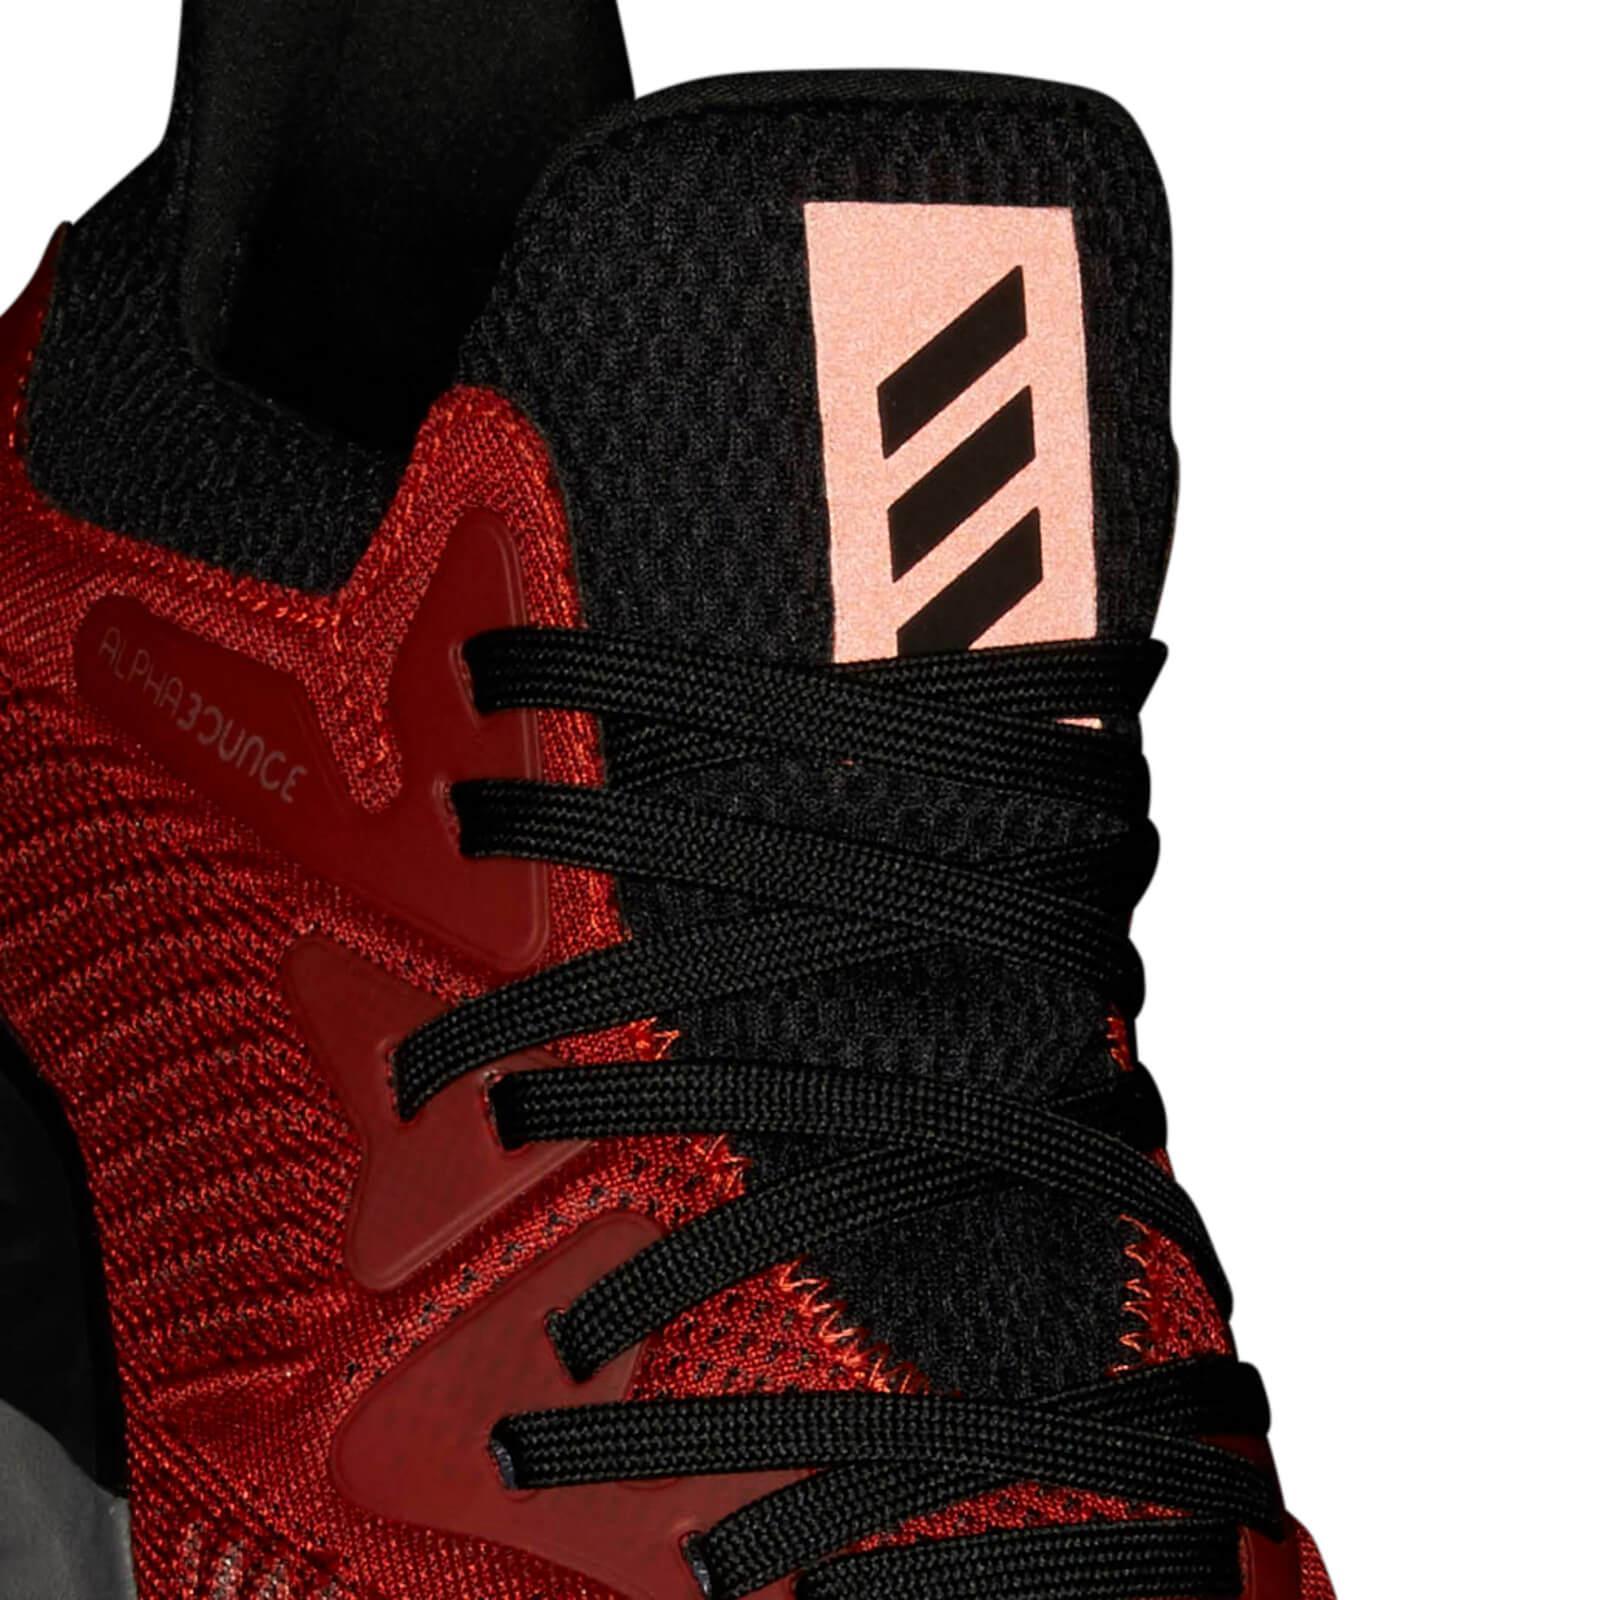 adidas Men's Alphabounce 2 Training Shoes RedBlack